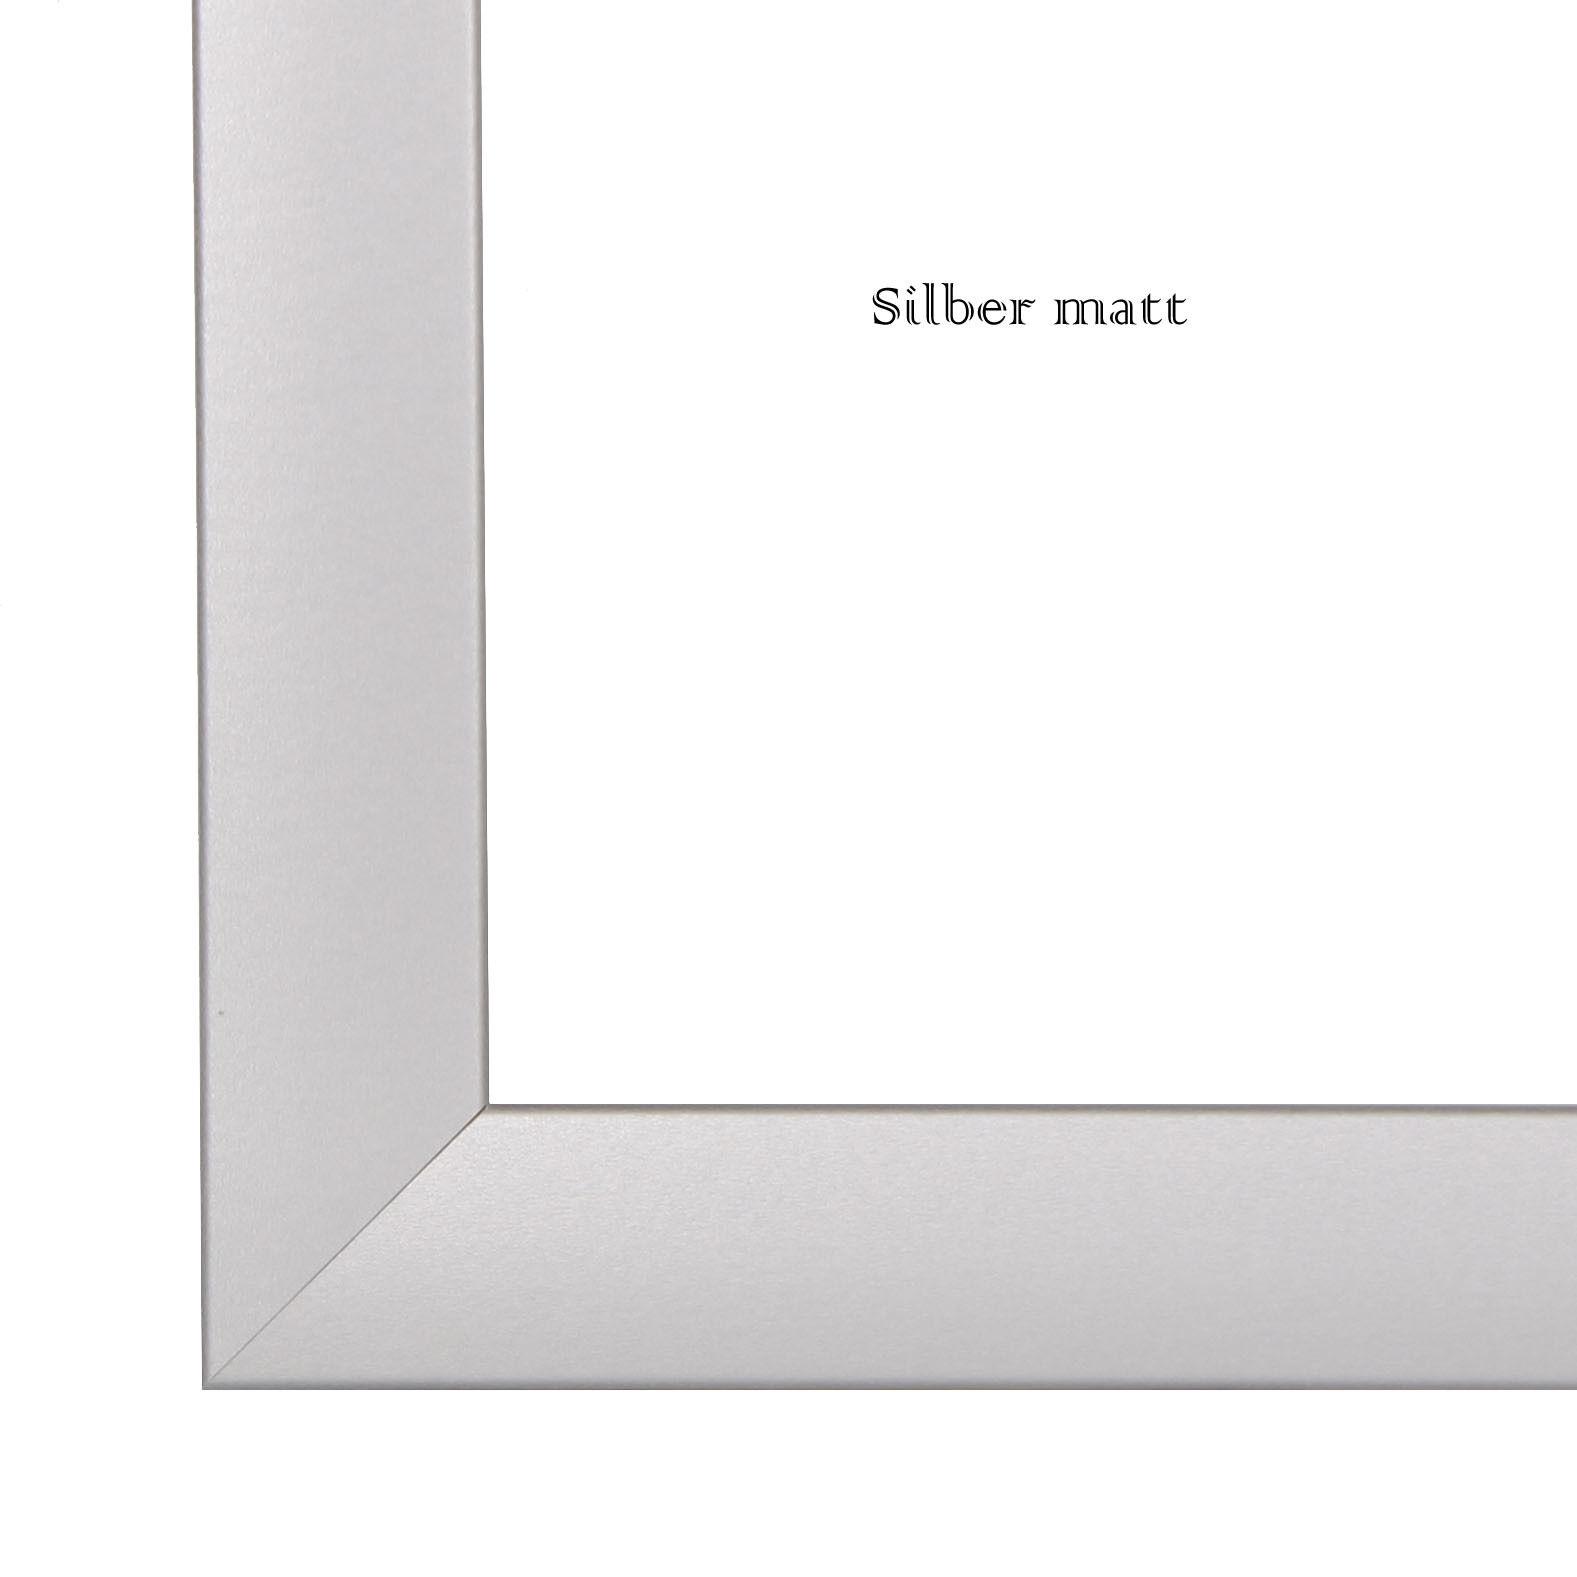 MARCO MARCO MARCO 22 ColorES DESDE 61x65 hasta 61x75 cm Foto Panorama Póster Marco NUEVO cea2e6